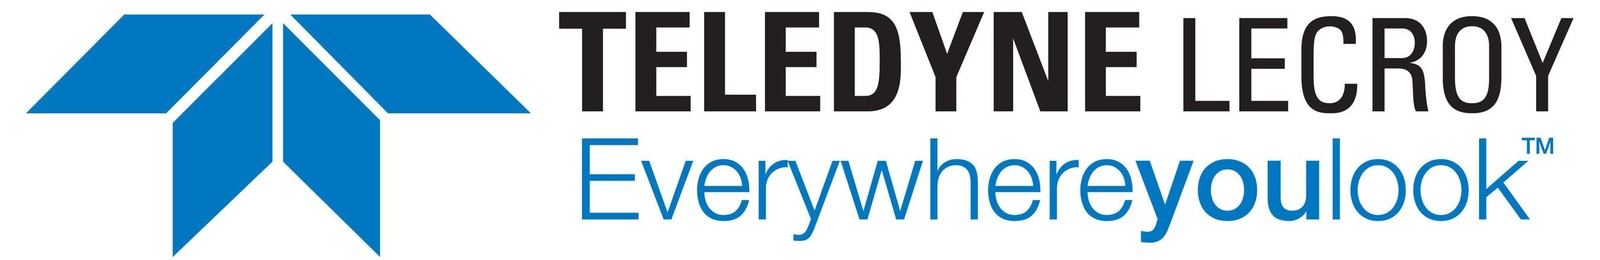 teledyne lecroy introduces bluetooth protocol expert